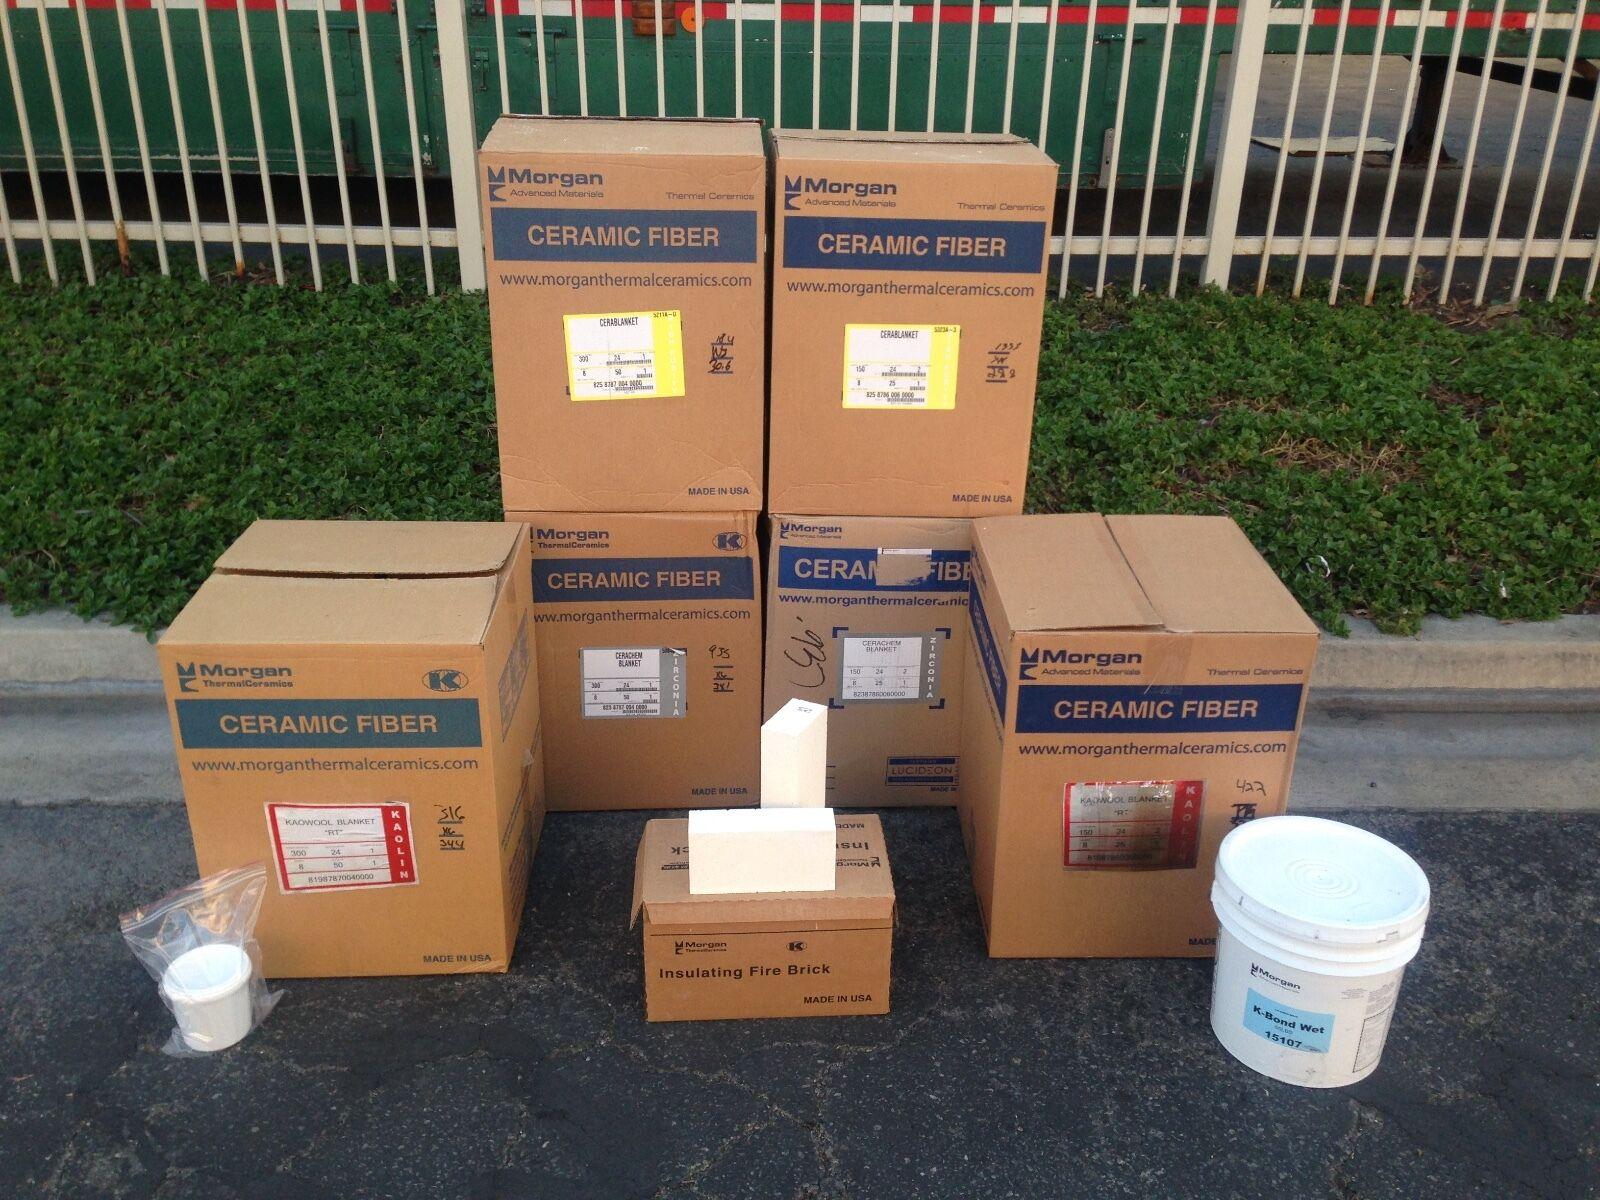 Morgan Thermal Ceramics Izayncom 2quot Ceramic Fiber Insulation Blanket Kaowool Rt 2300f 8